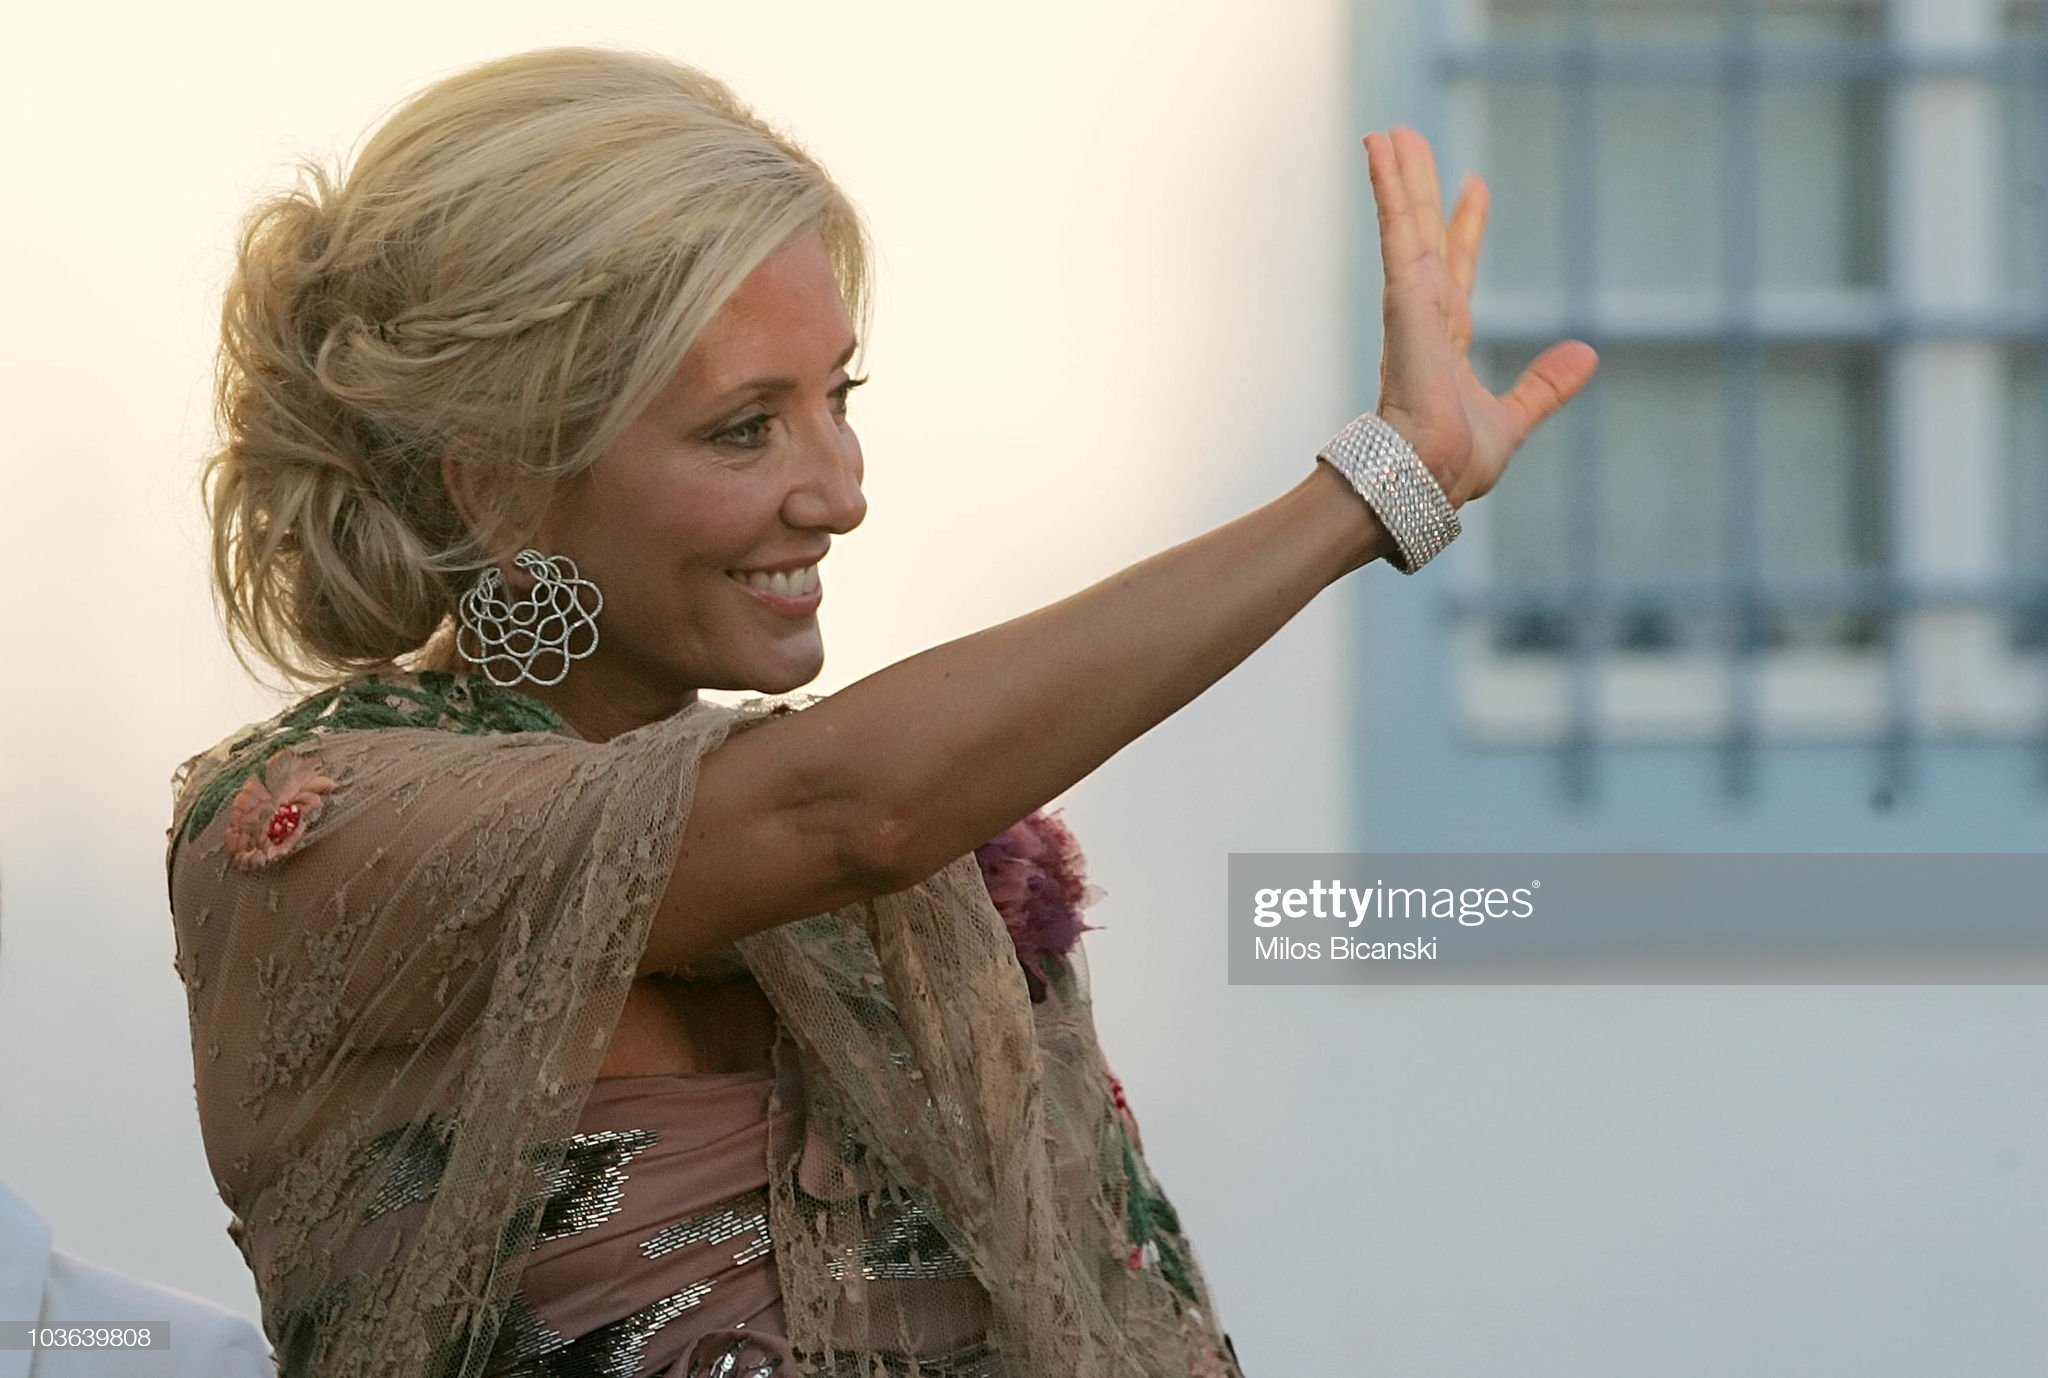 Wedding of Prince Nikolaos and Miss Tatiana Blatnik - Wedding Service : News Photo